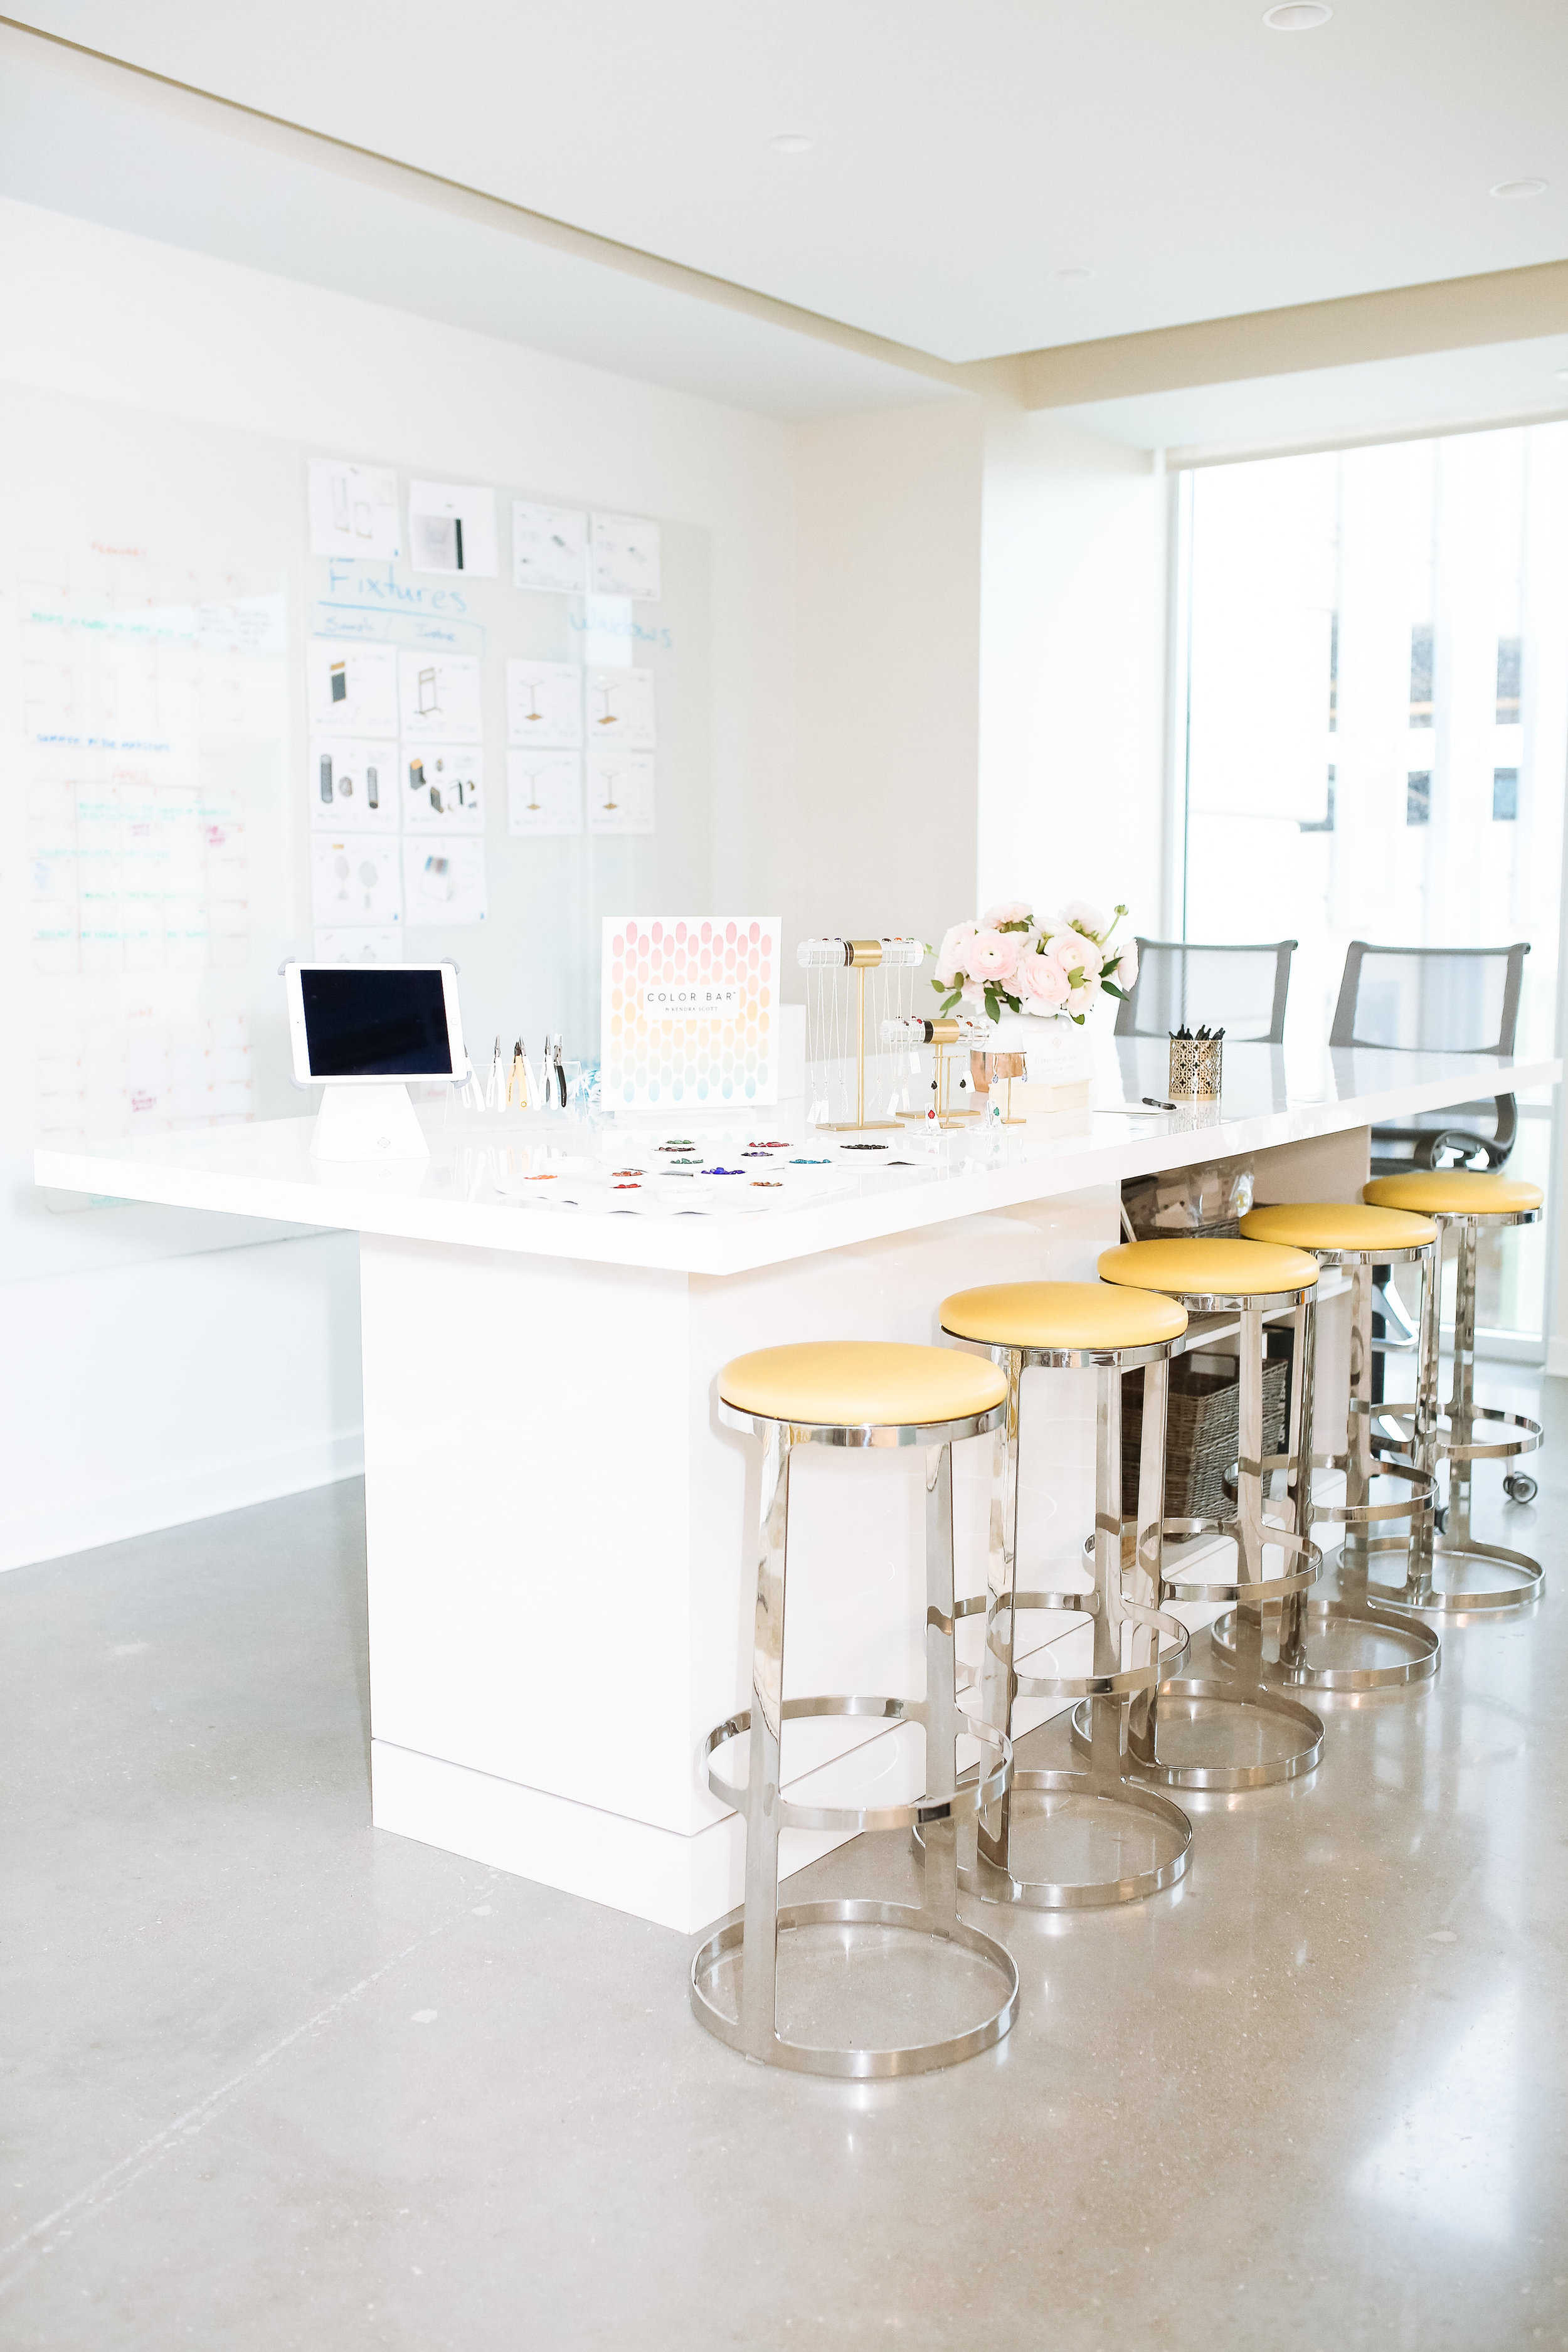 Kendra Scott Office-0075.jpg